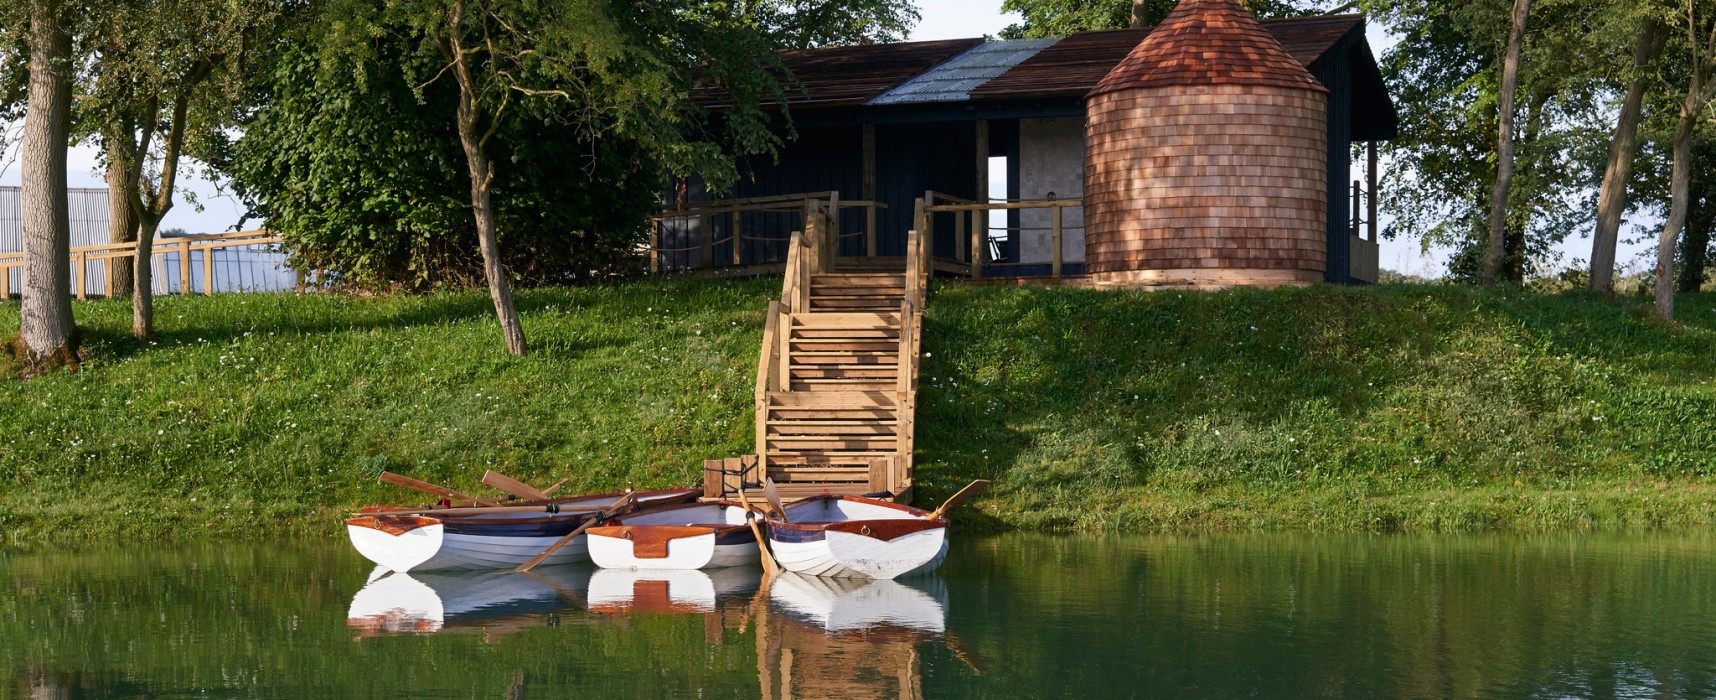 4 Active Activities in Oxfordshire